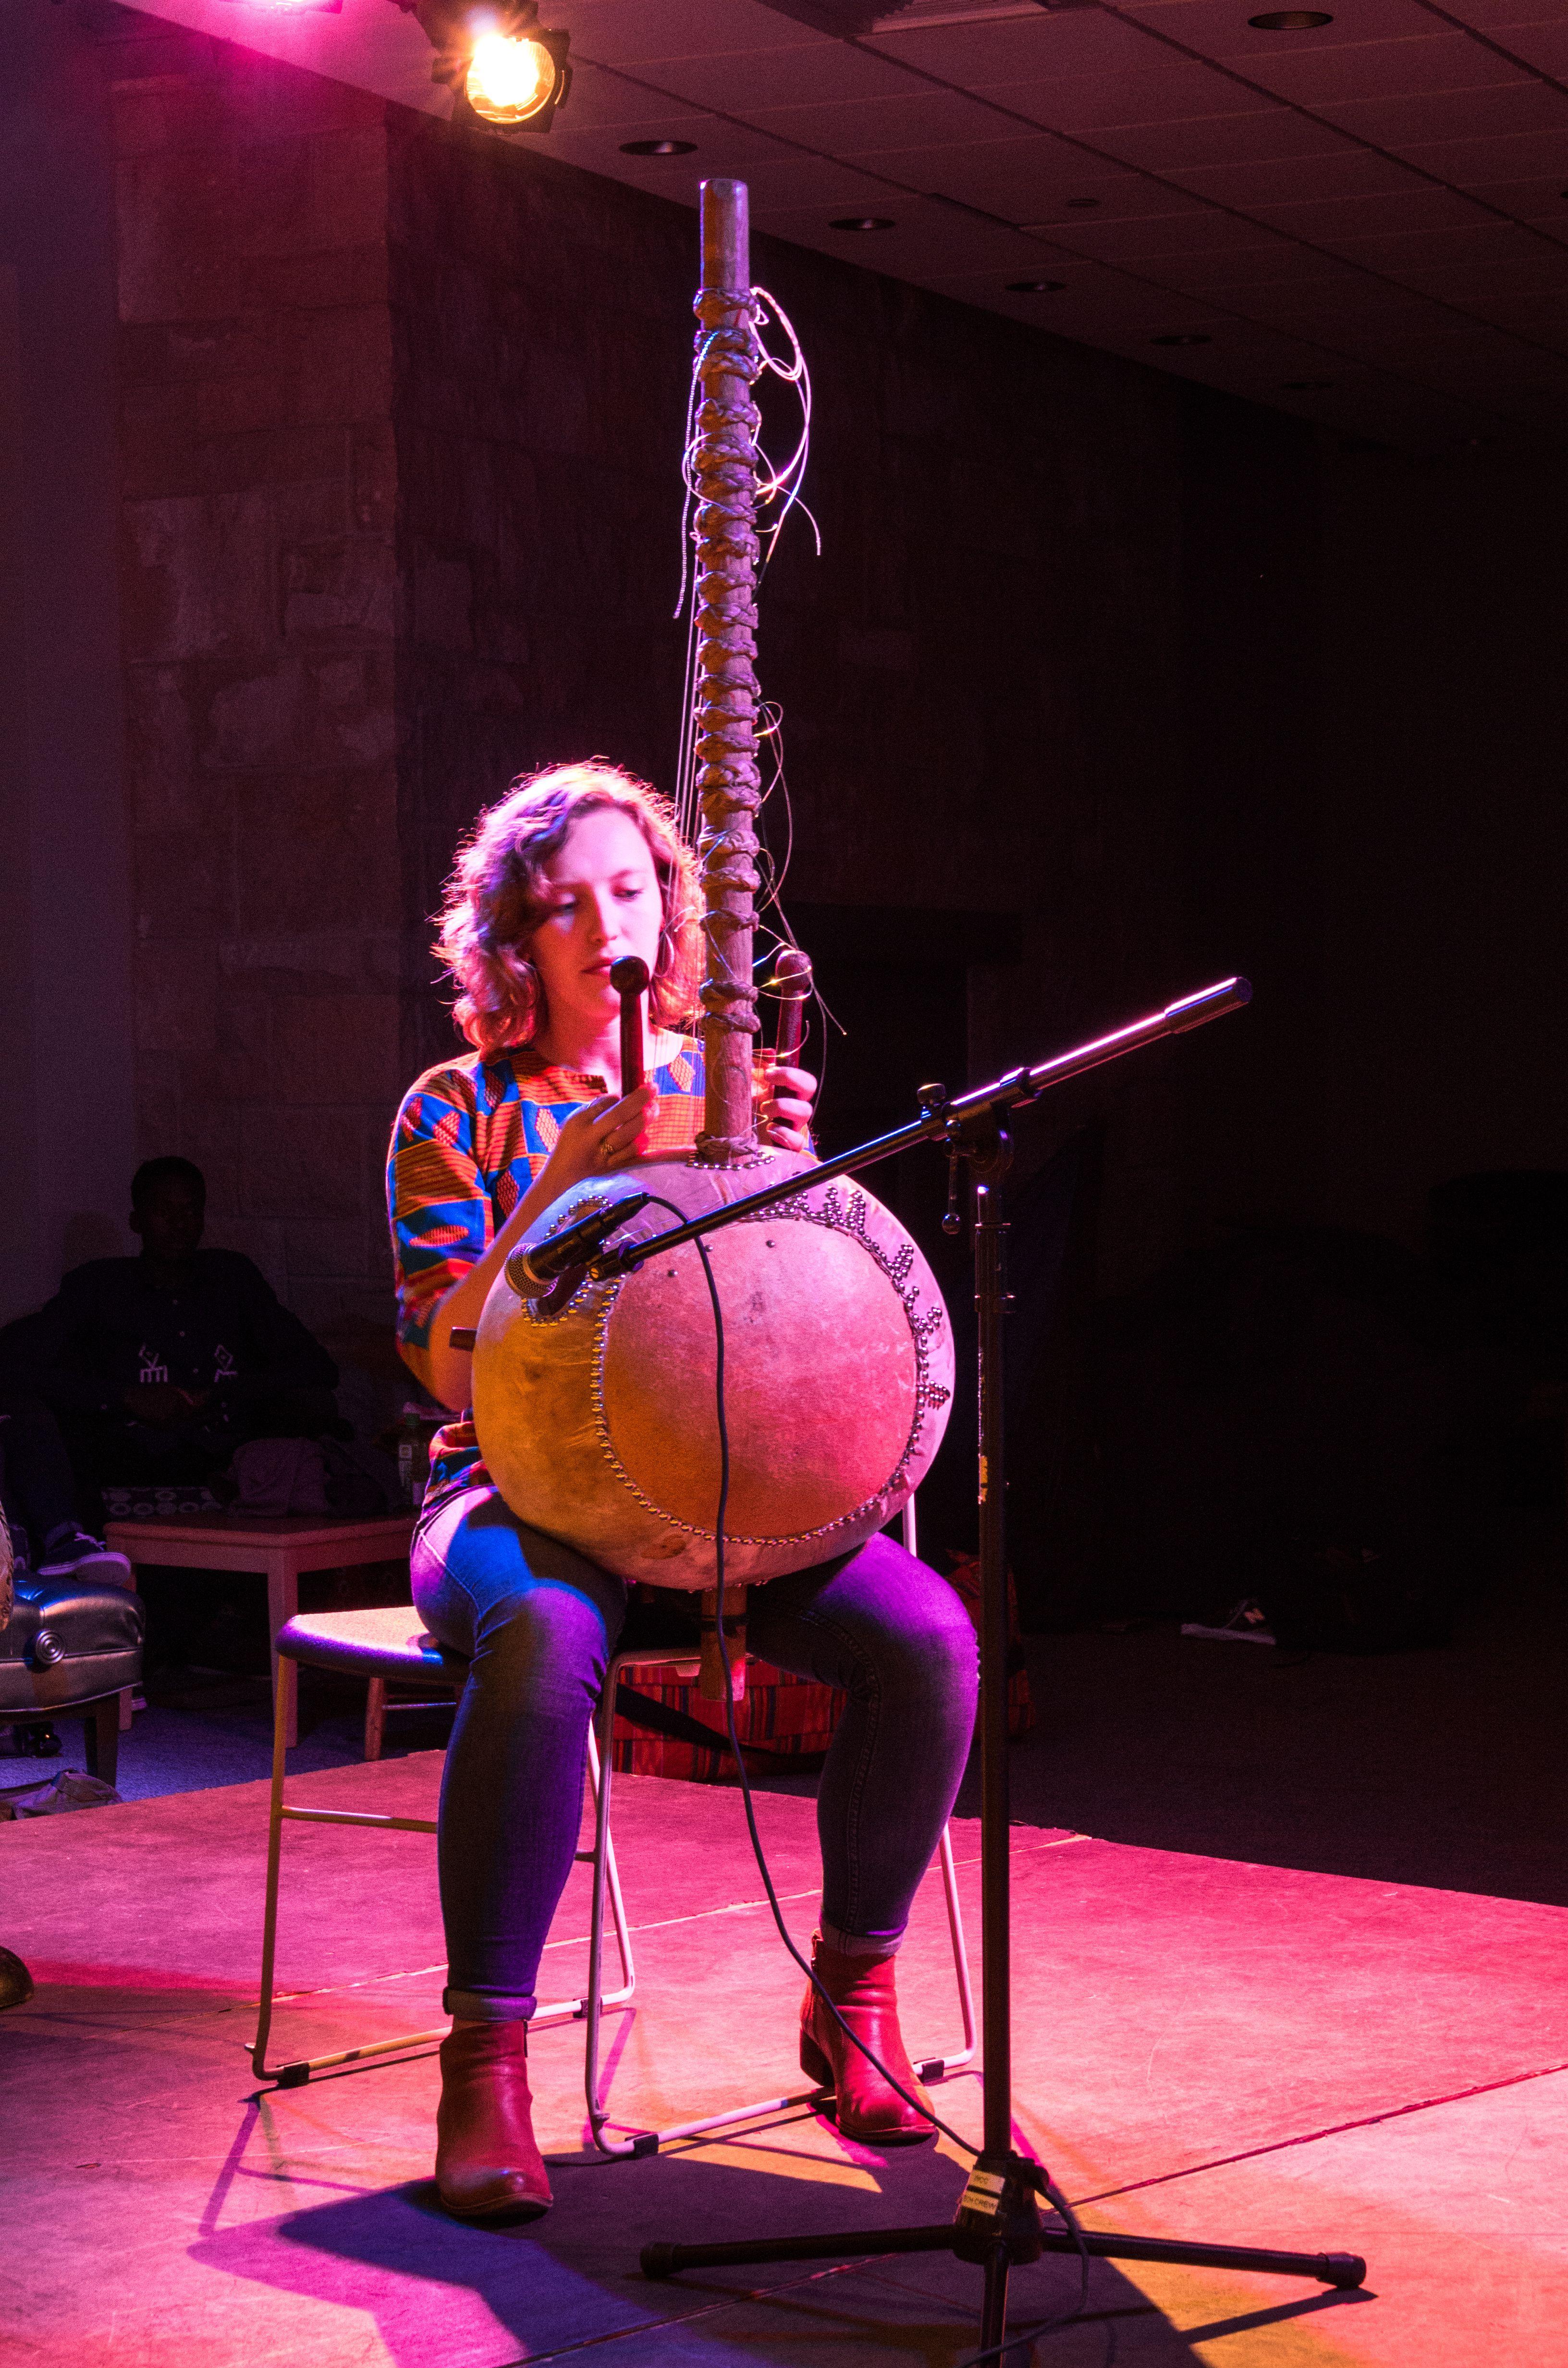 Senior Torrey Smith plays the kora, a popular West African instrument.